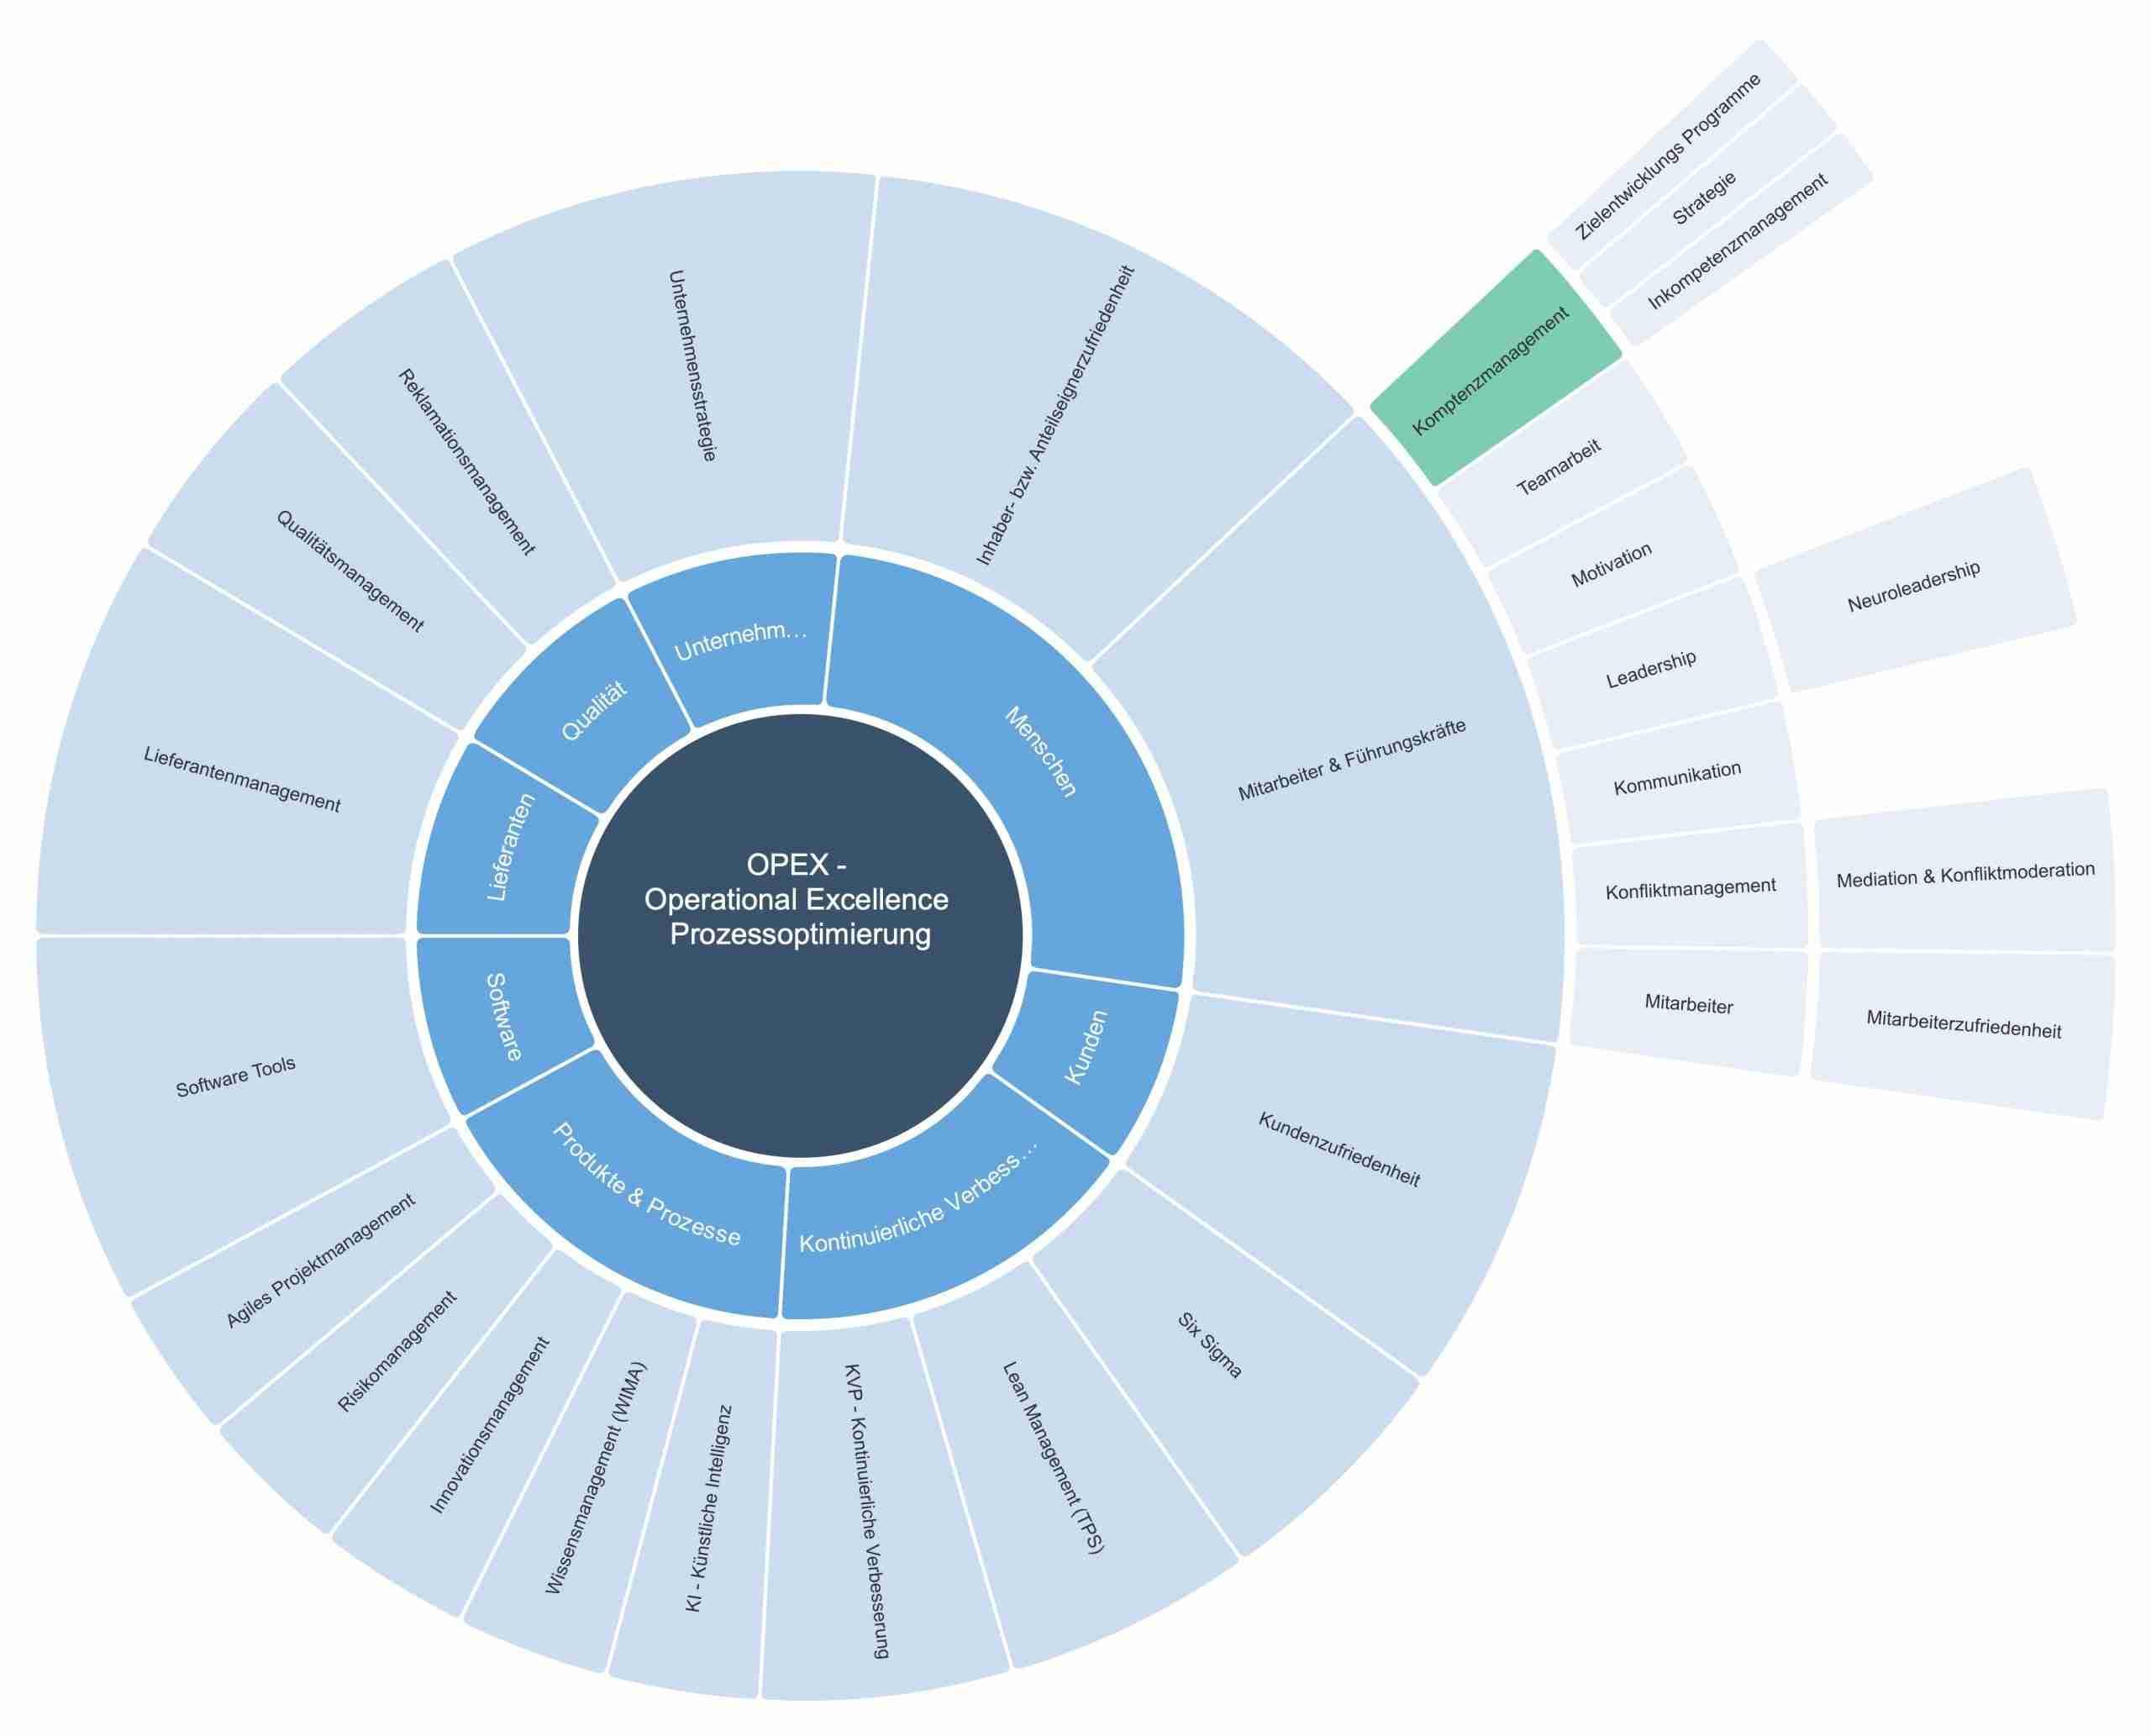 kompetenzmanagement im opex modell